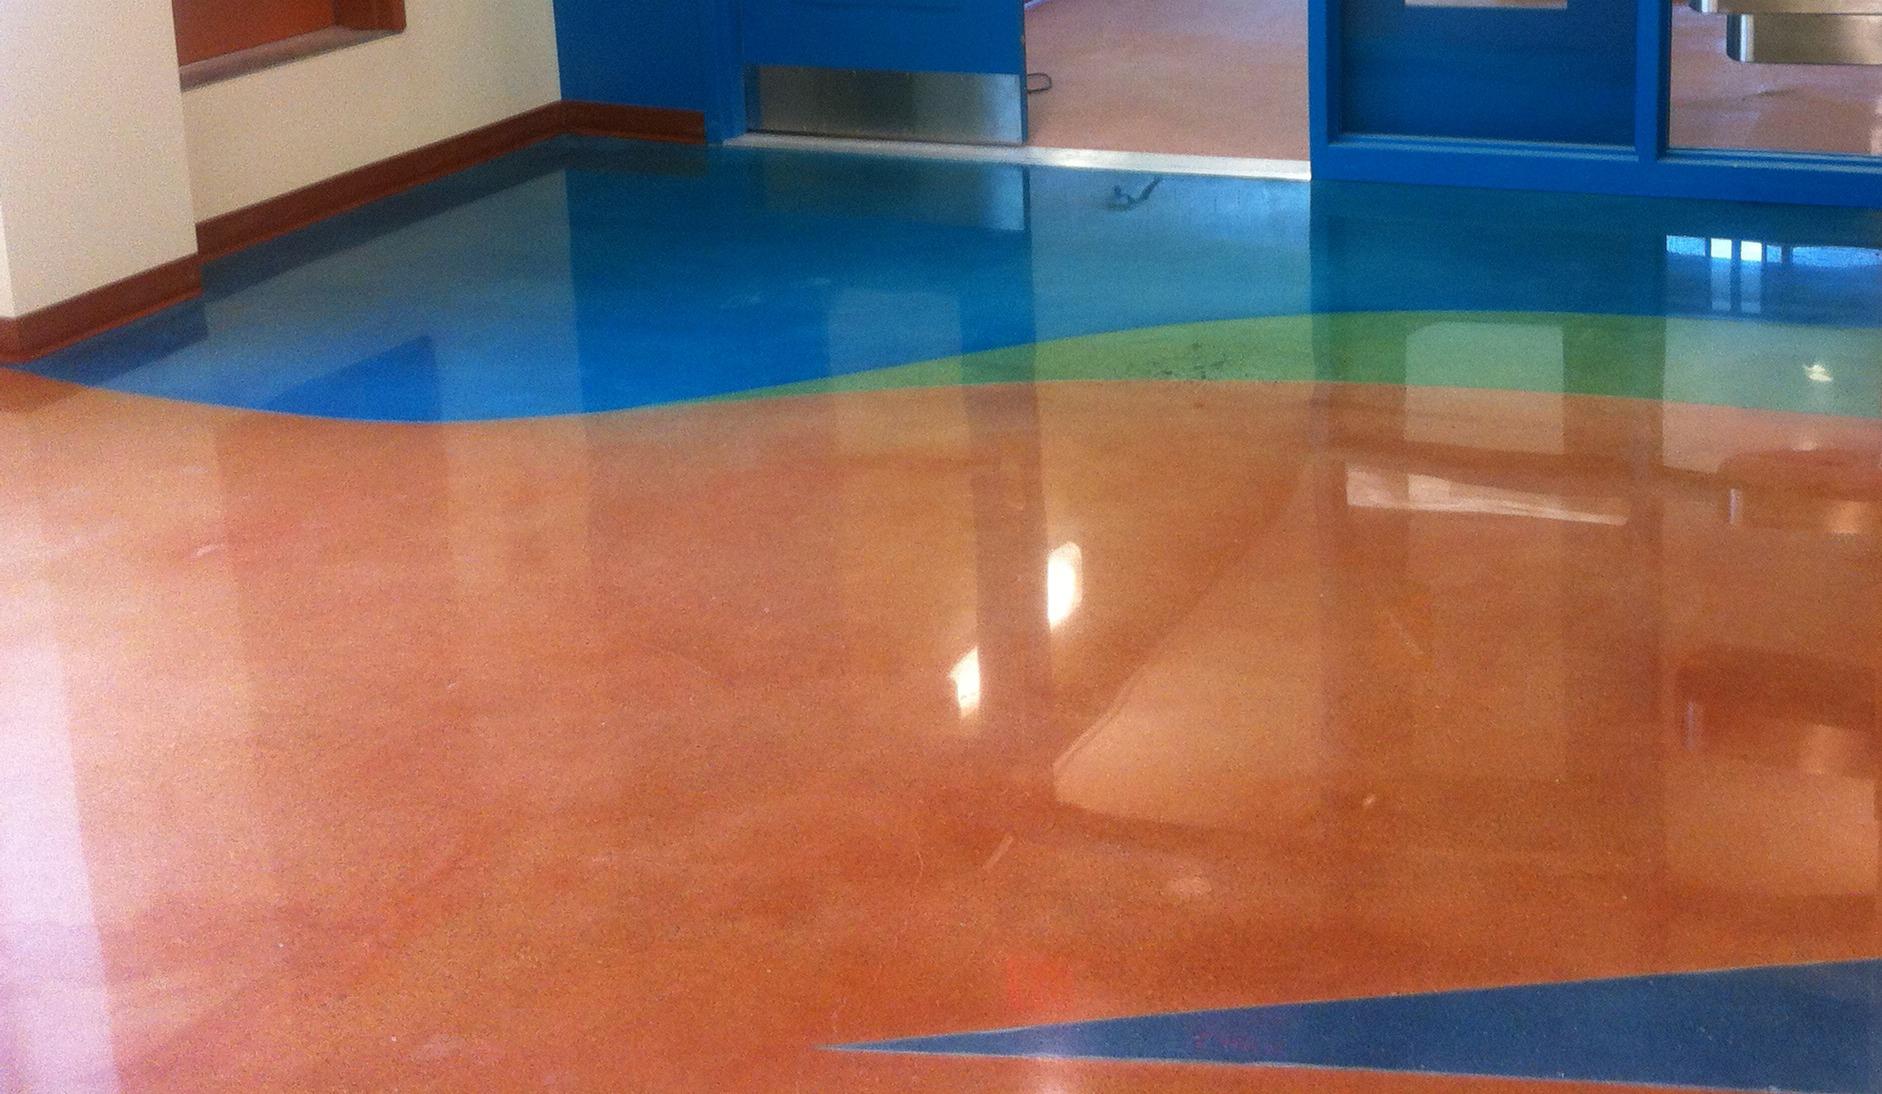 Elementary School Entry Floors